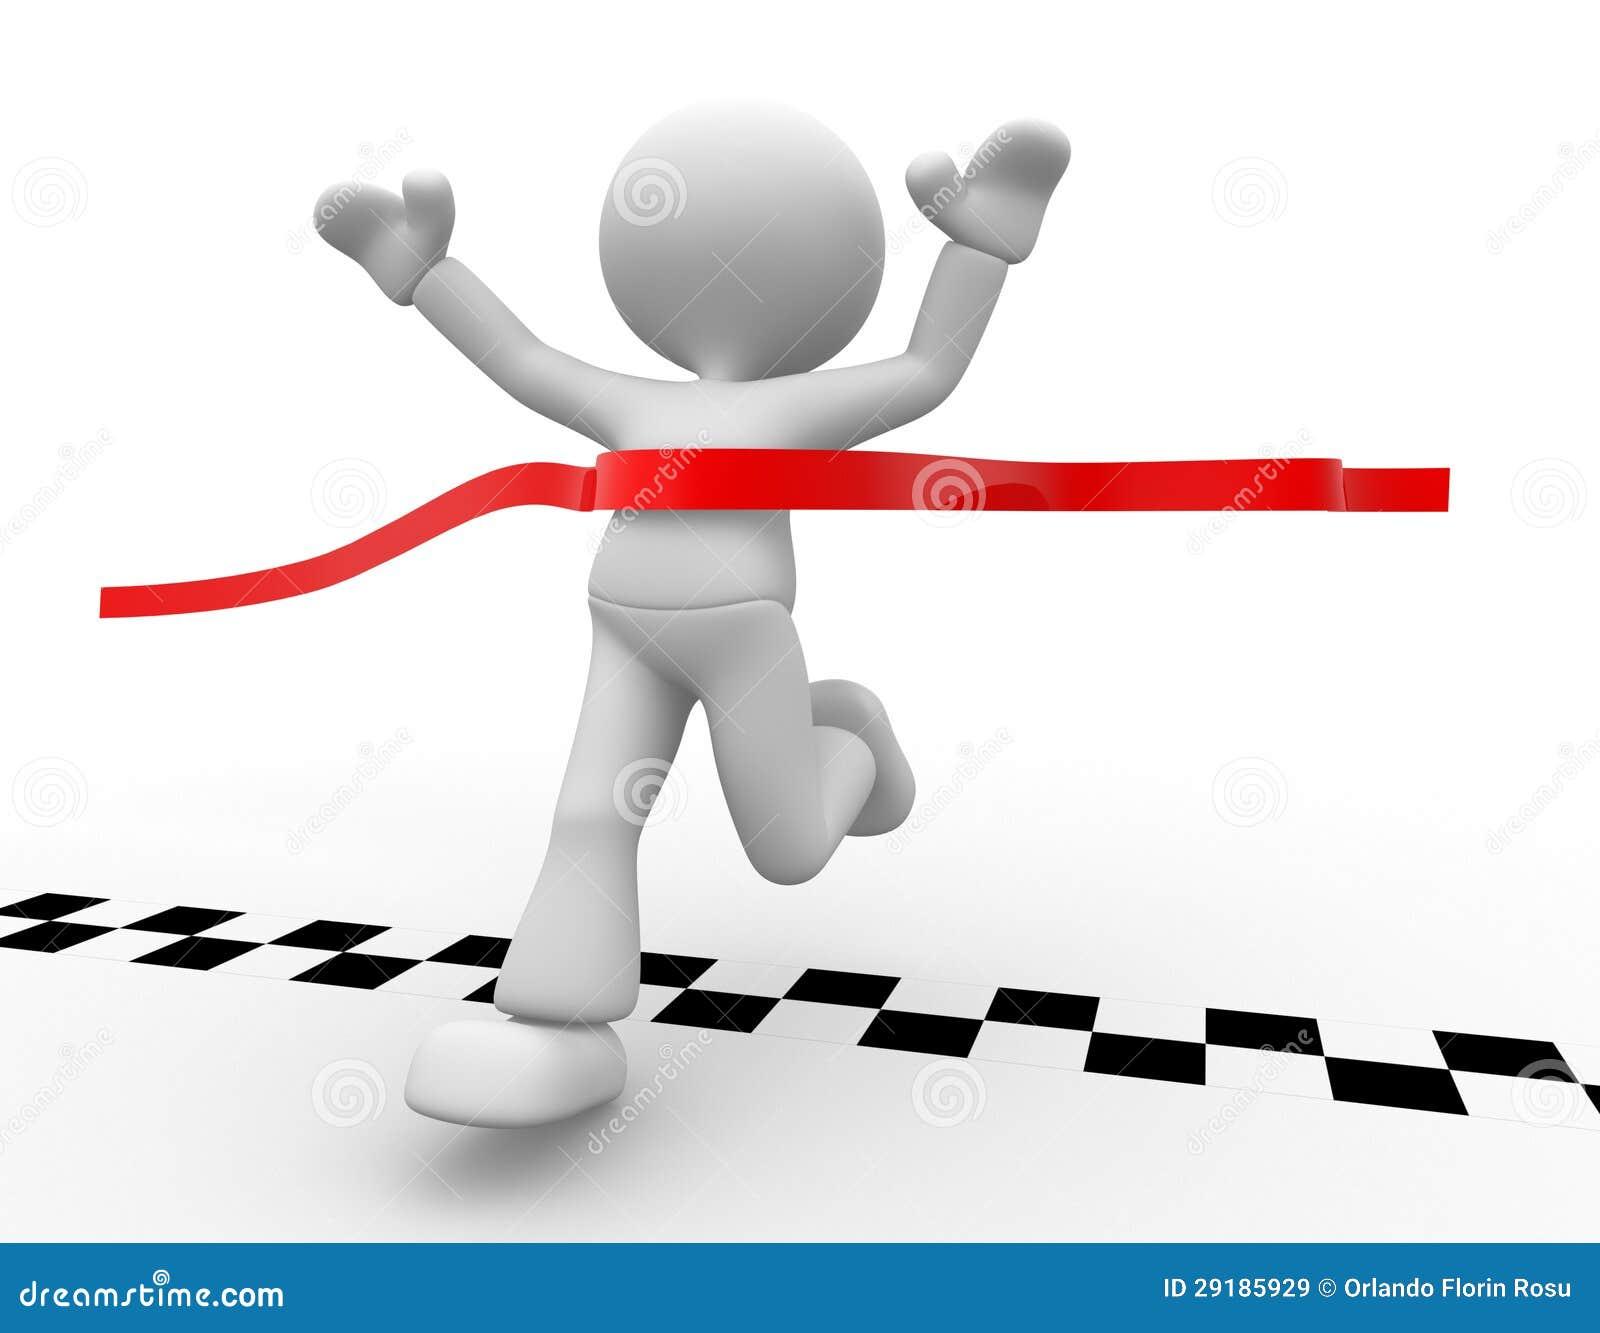 Finish Line Royalty Free Stock Images - Image: 29185929